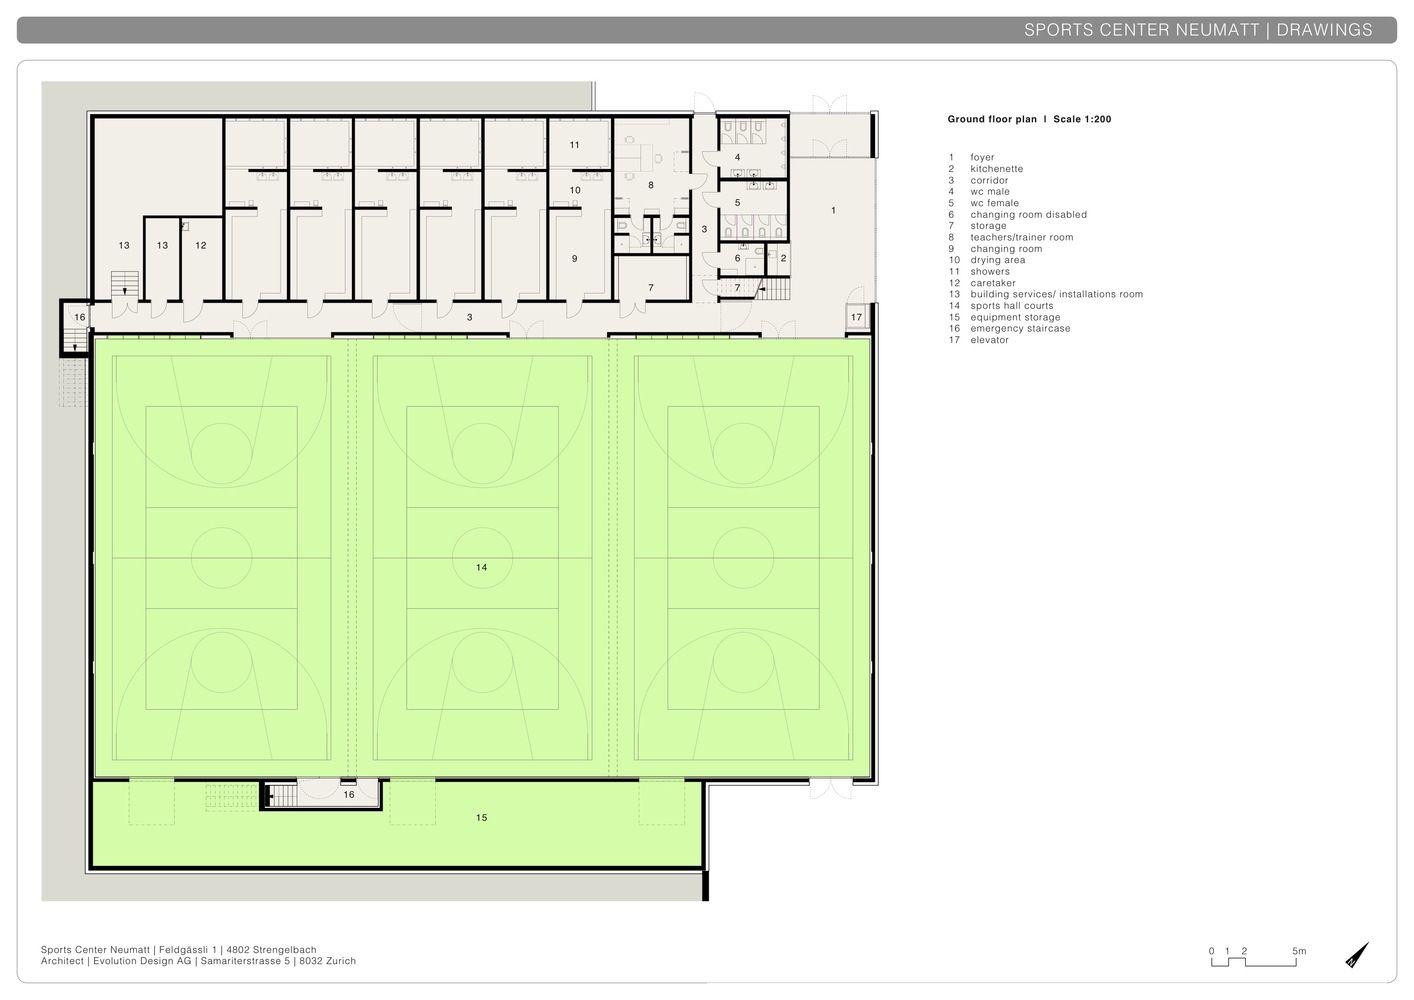 Gallery Of Neumatt Sports Center Evolution Design 30 Sports Sport Hall Indoor Volleyball